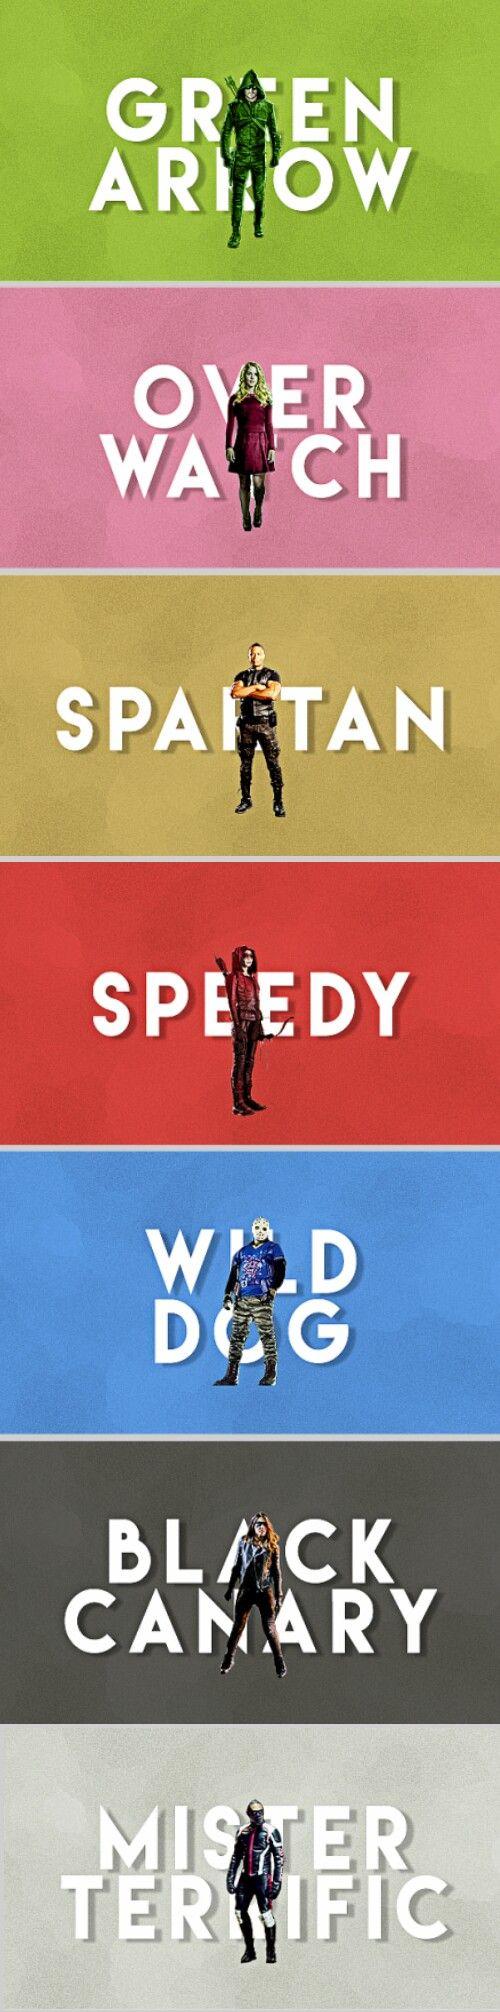 Team Arrow | Green Arrow - Overwatch - Spartan - Speedy - Wild Dog - Black Canary - Mister Terrific #season5 #arrow #cw